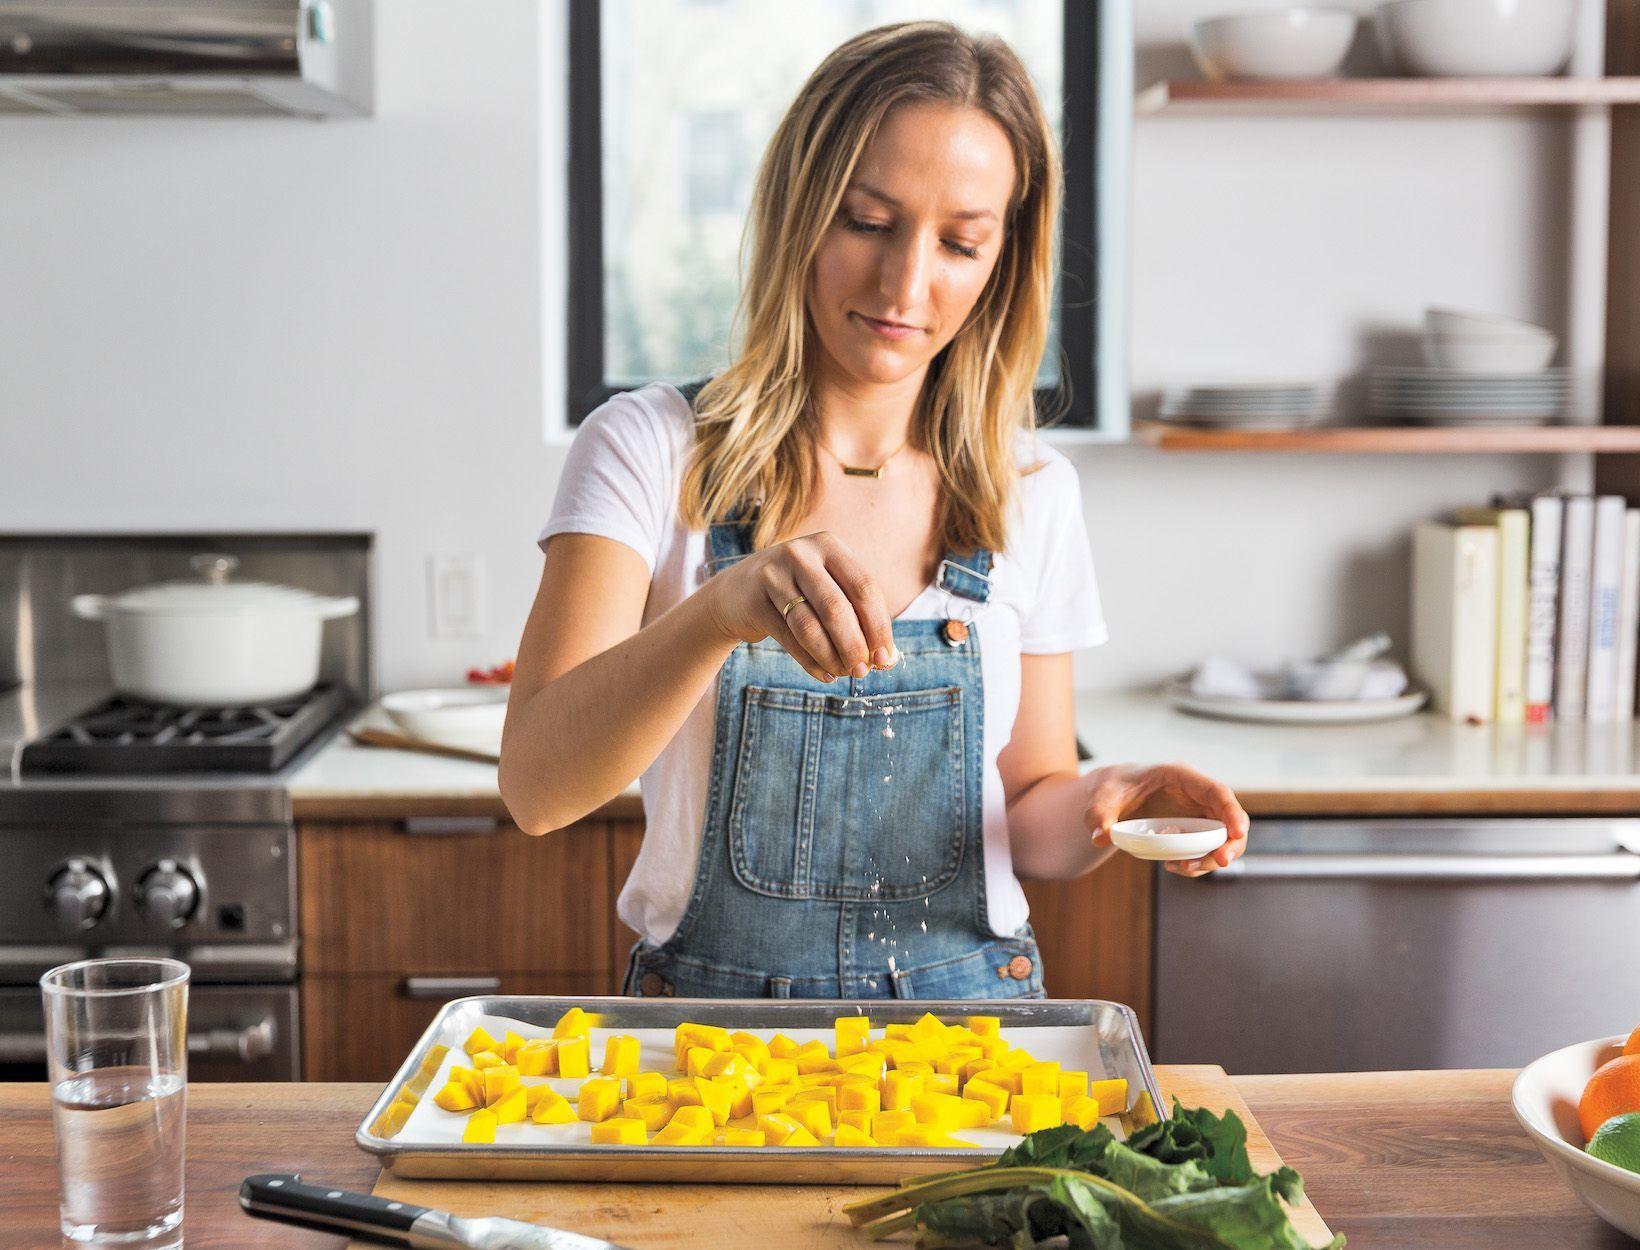 Pin on Adulting FOOD